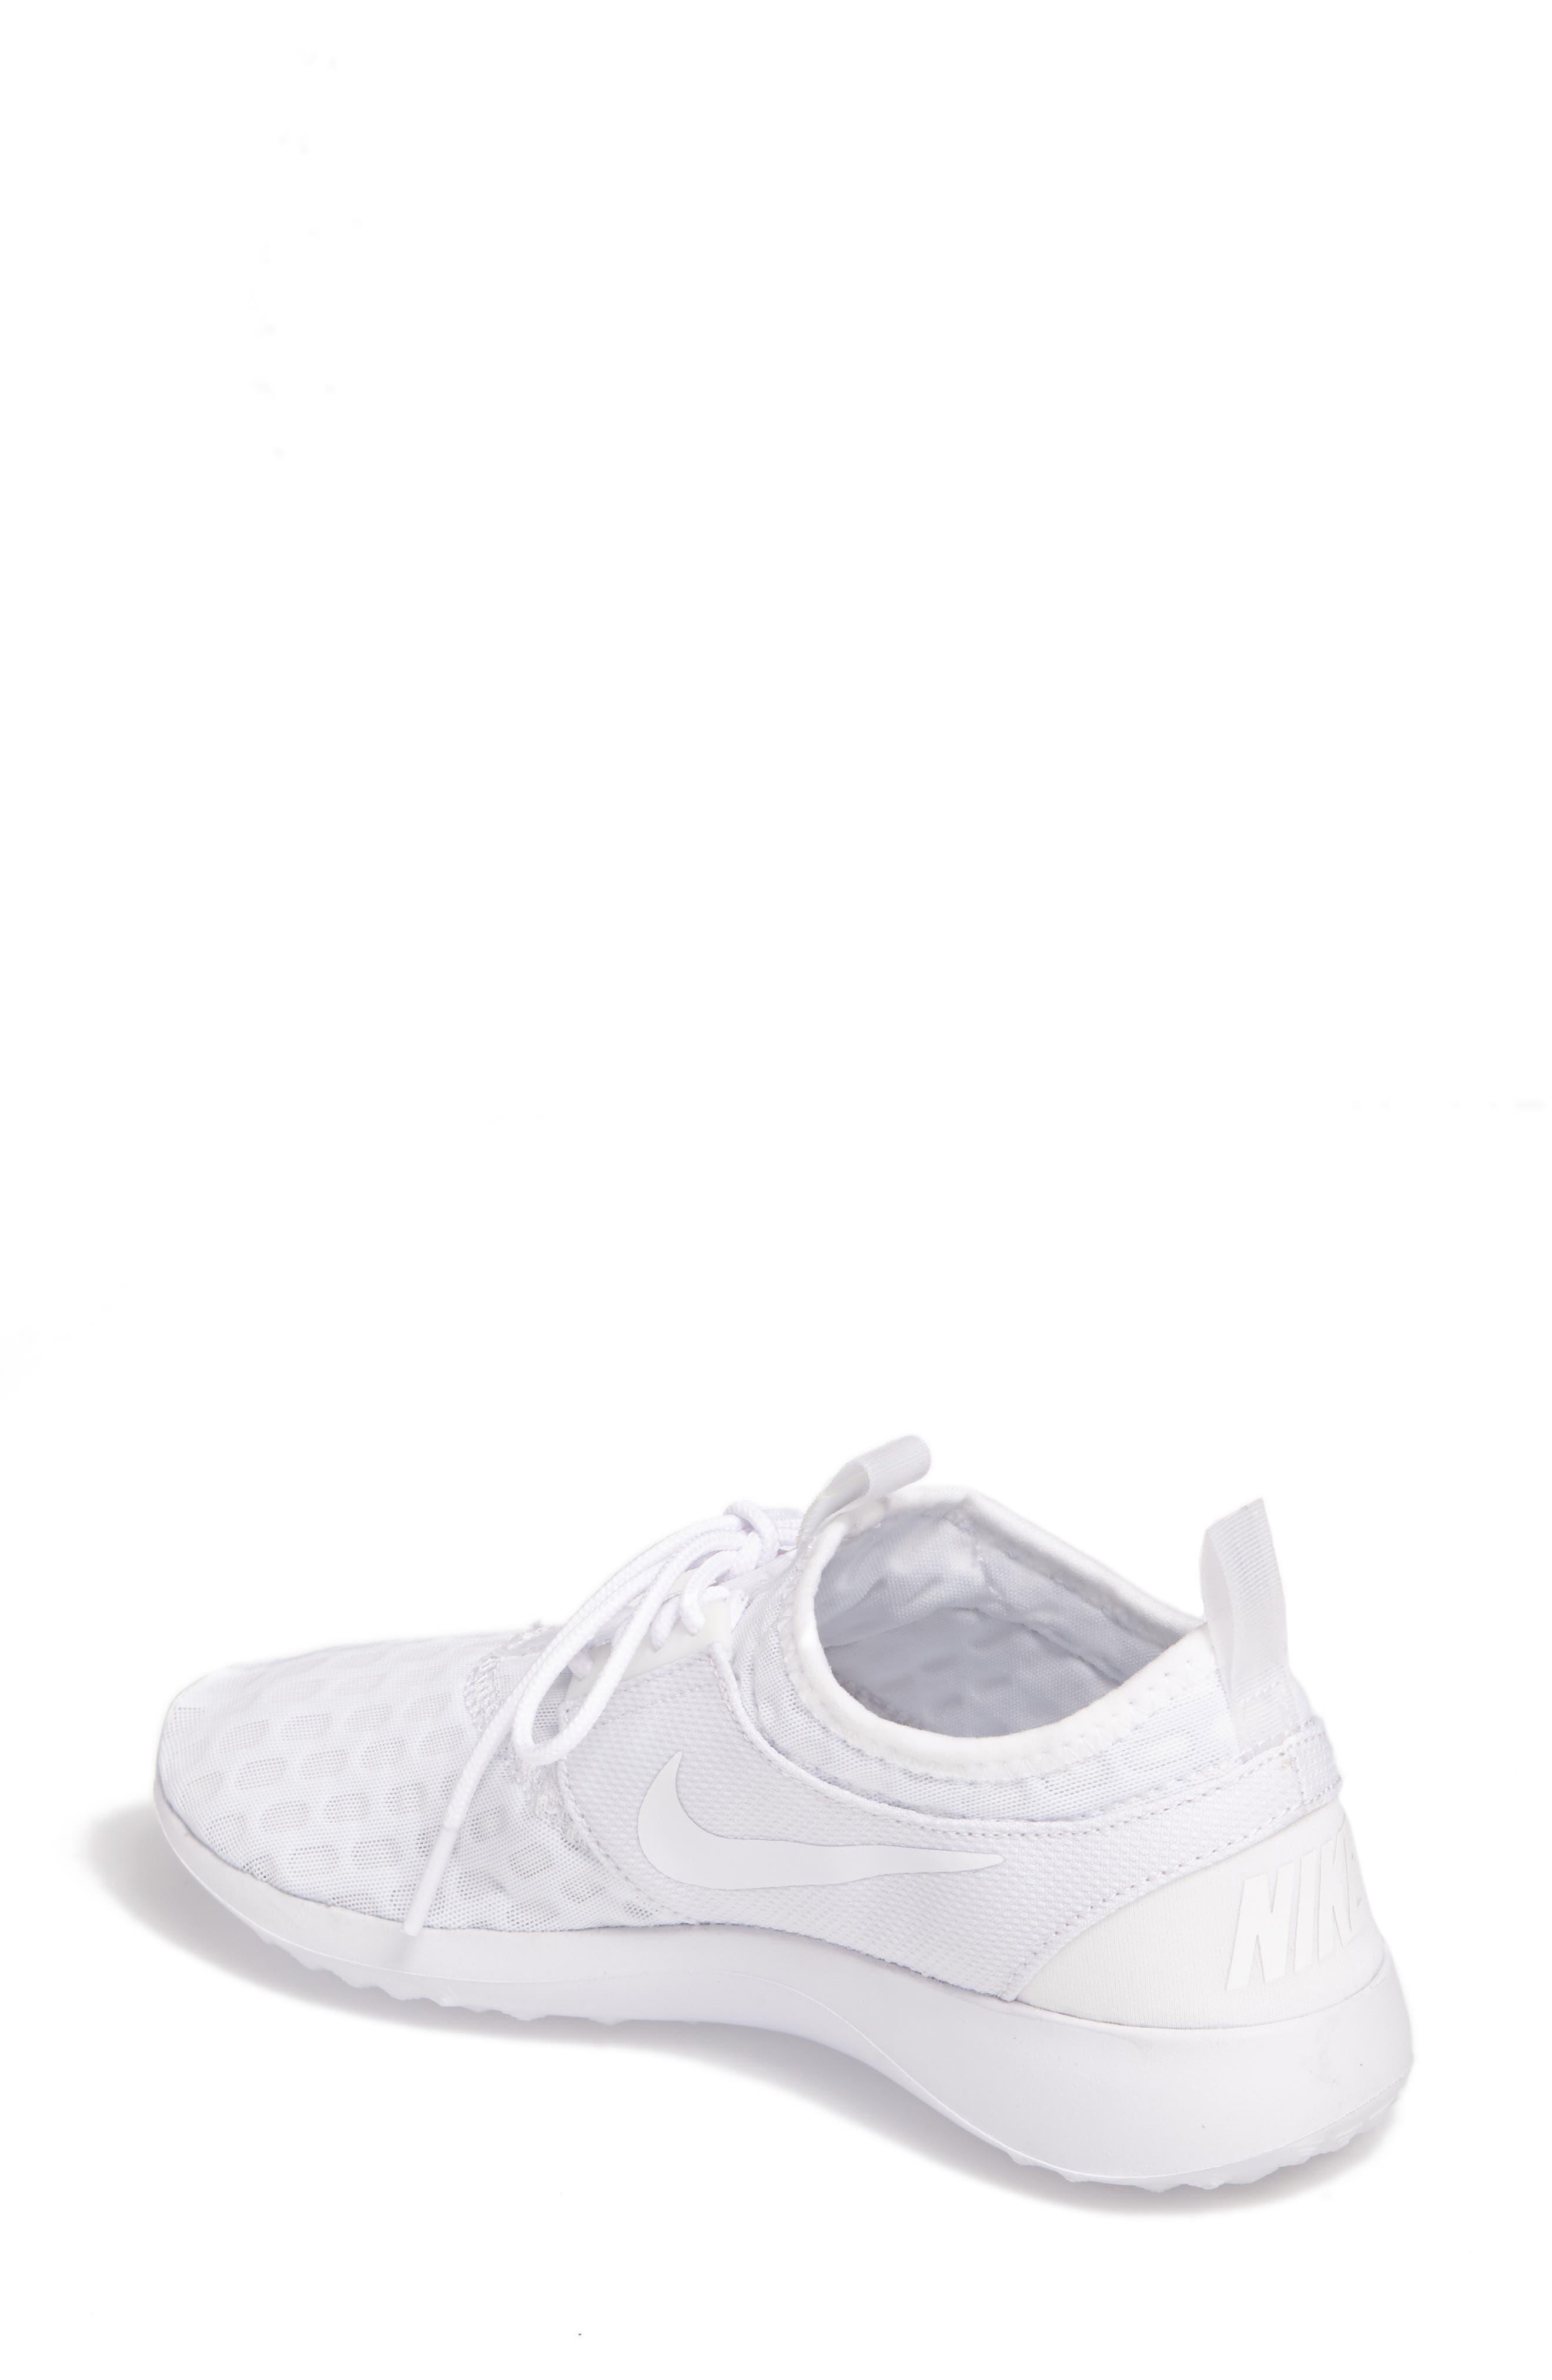 ,                             'Juvenate' Sneaker,                             Alternate thumbnail 107, color,                             103